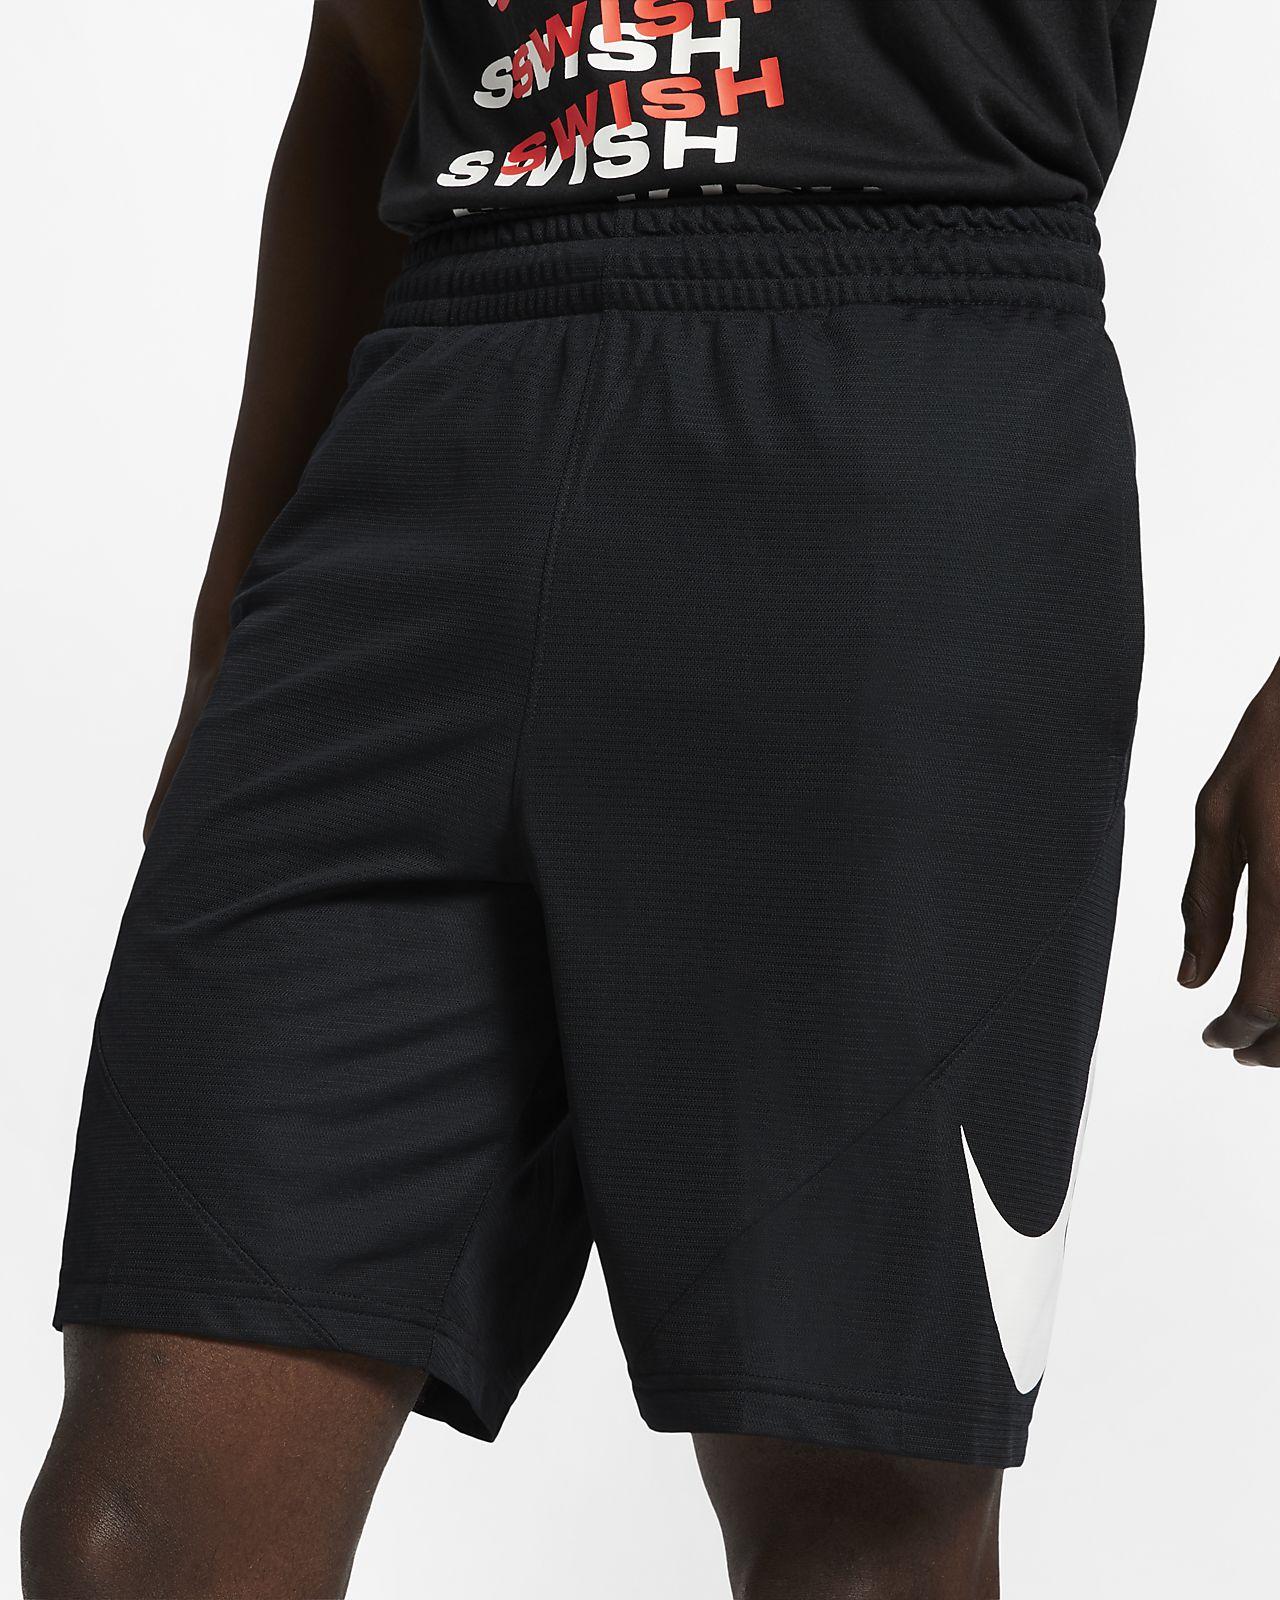 Nike 23 cm Erkek Basketbol Şortu